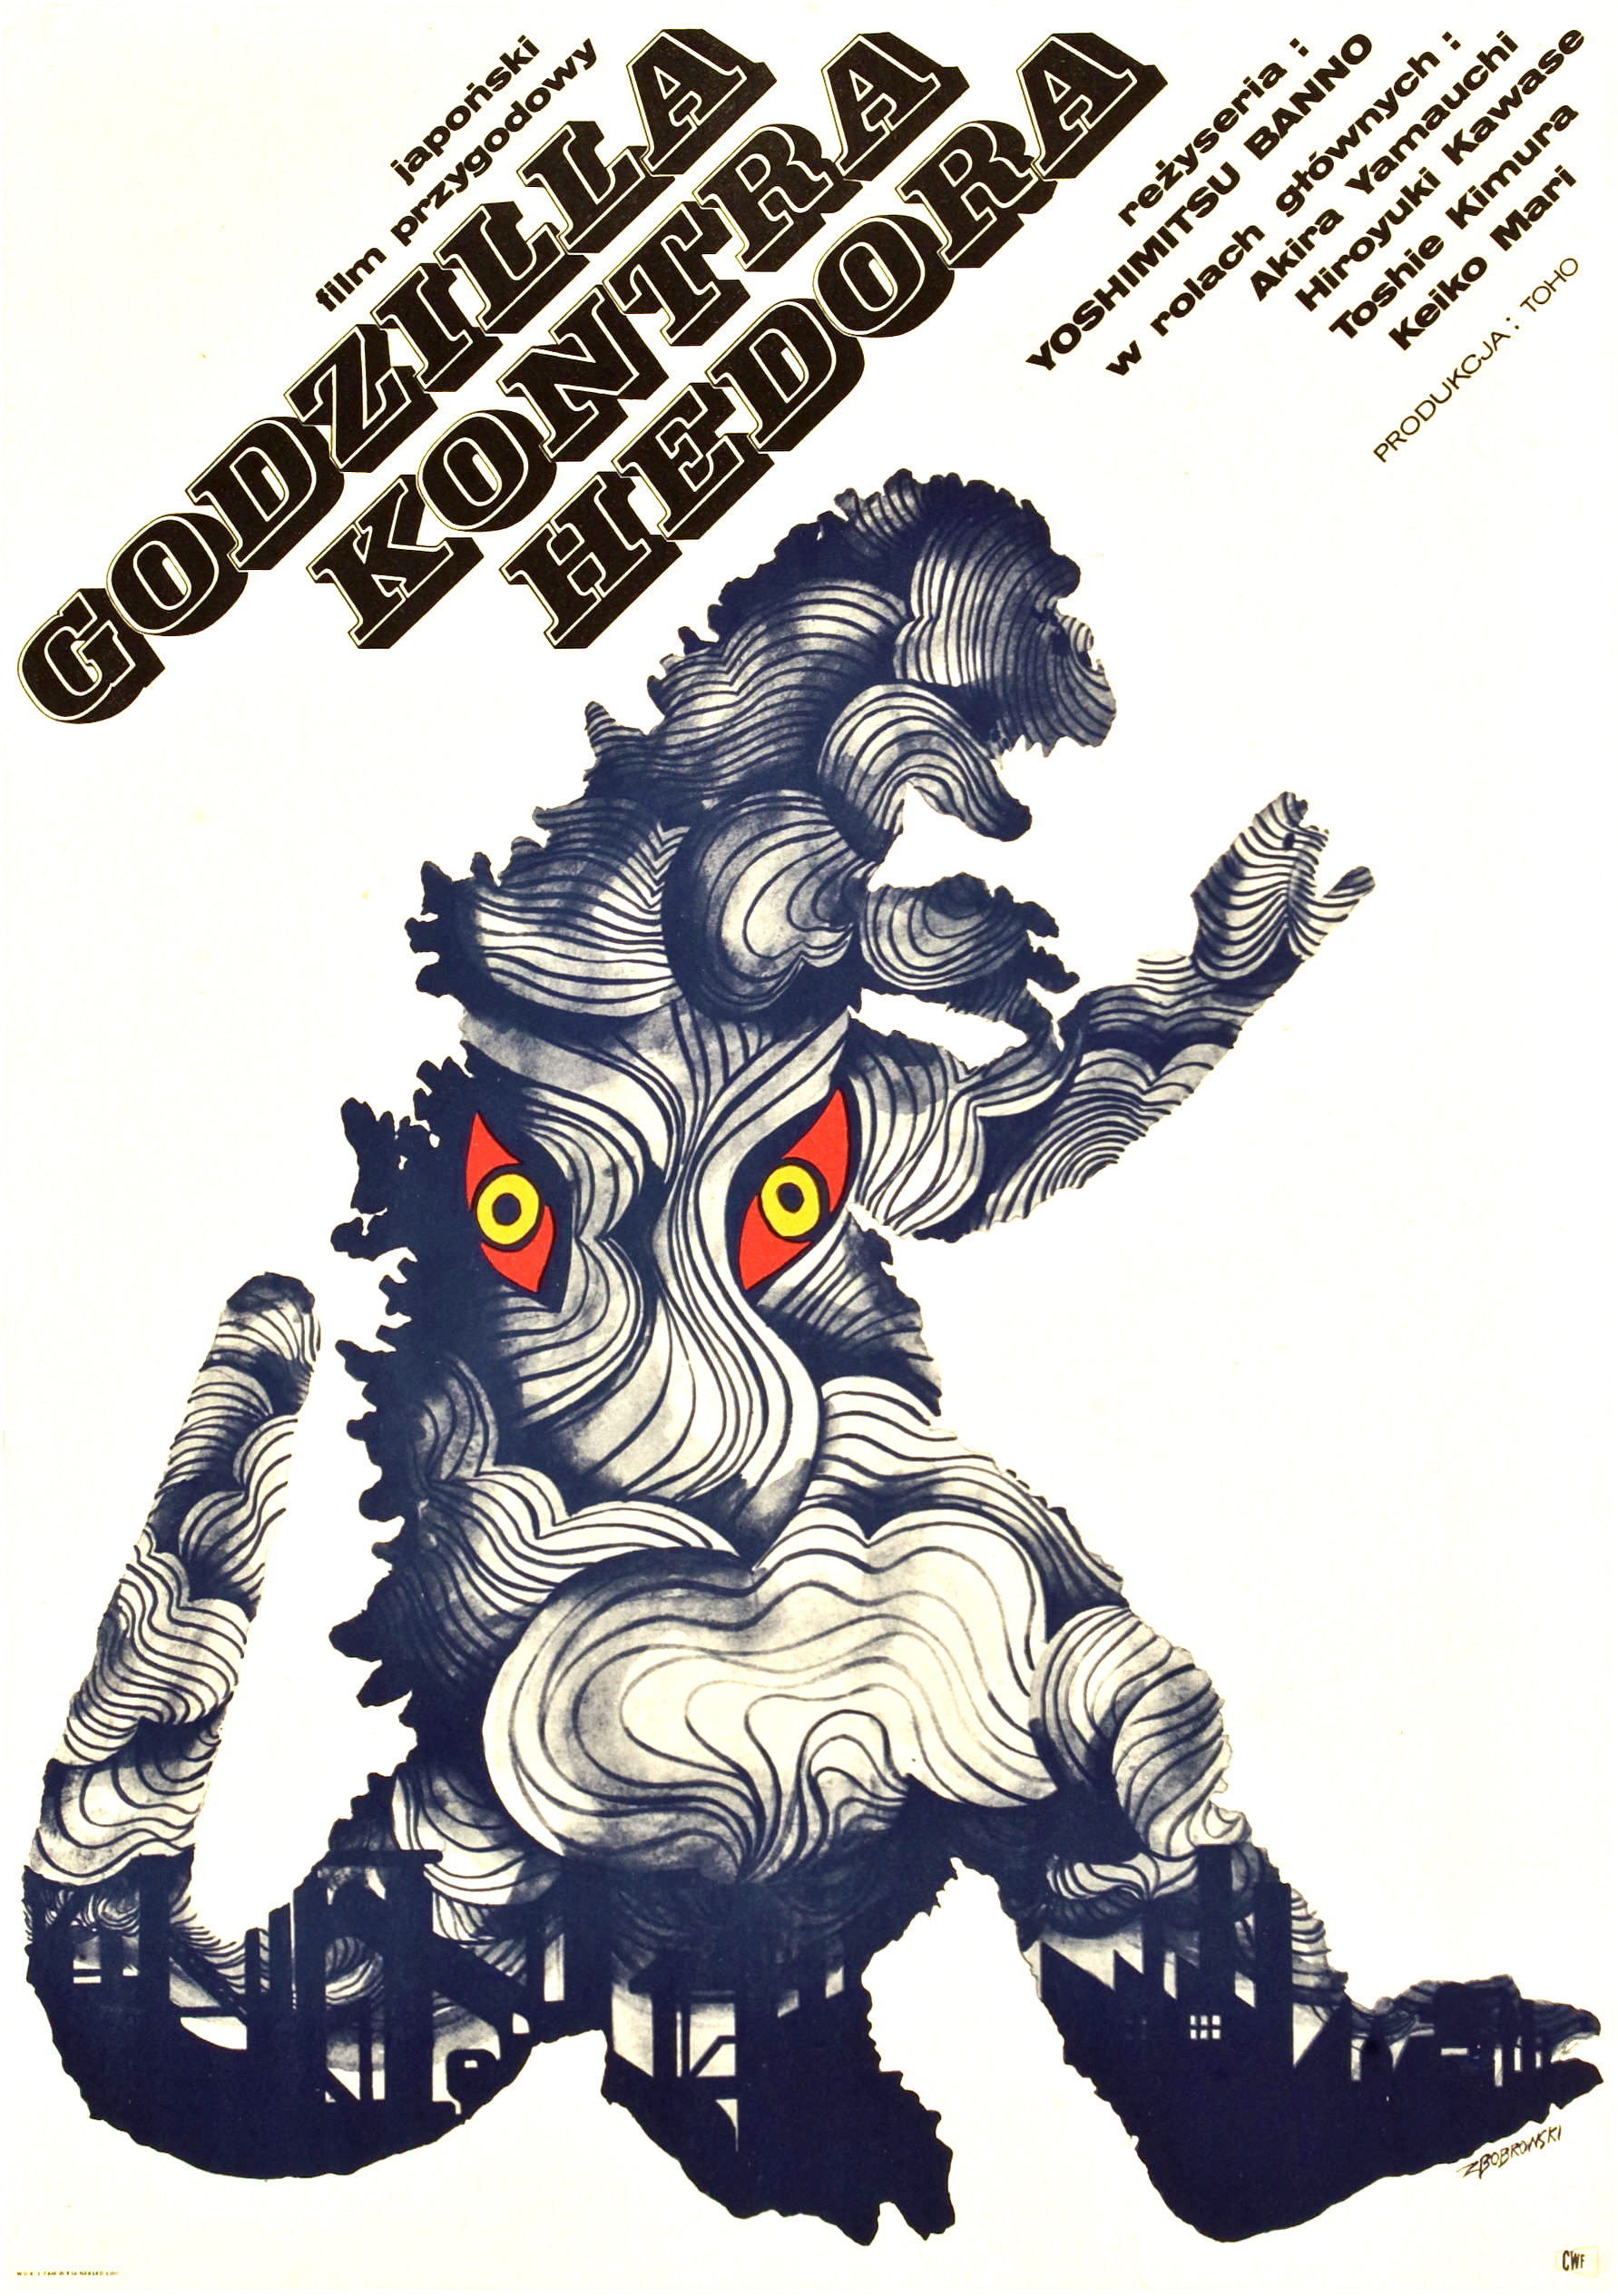 godzilla_vs_hedorah_poster_1971_04.jpg